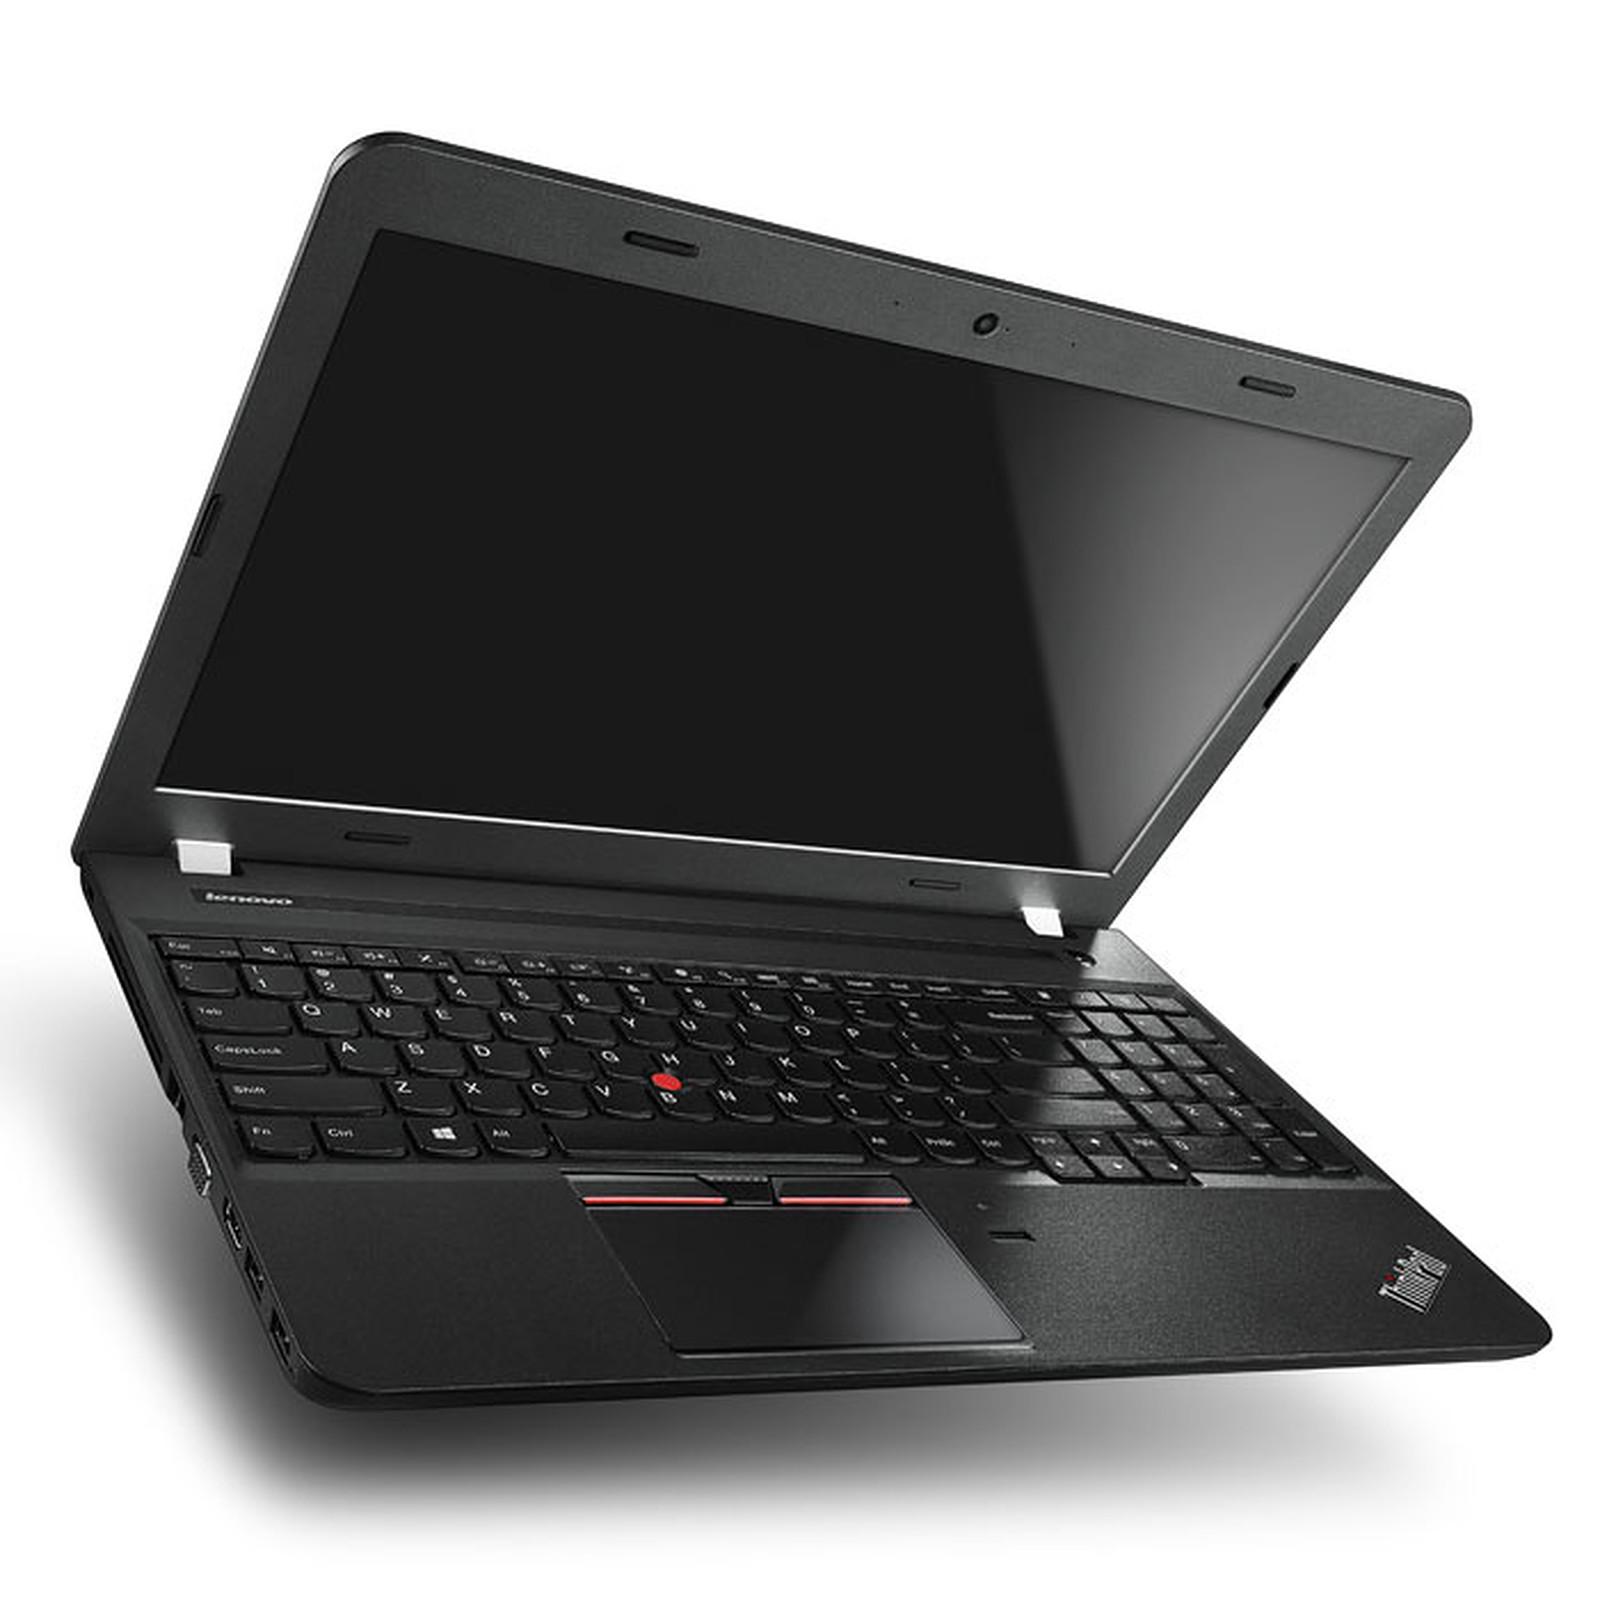 Lenovo ThinkPad E550 (20DF00CUFR)